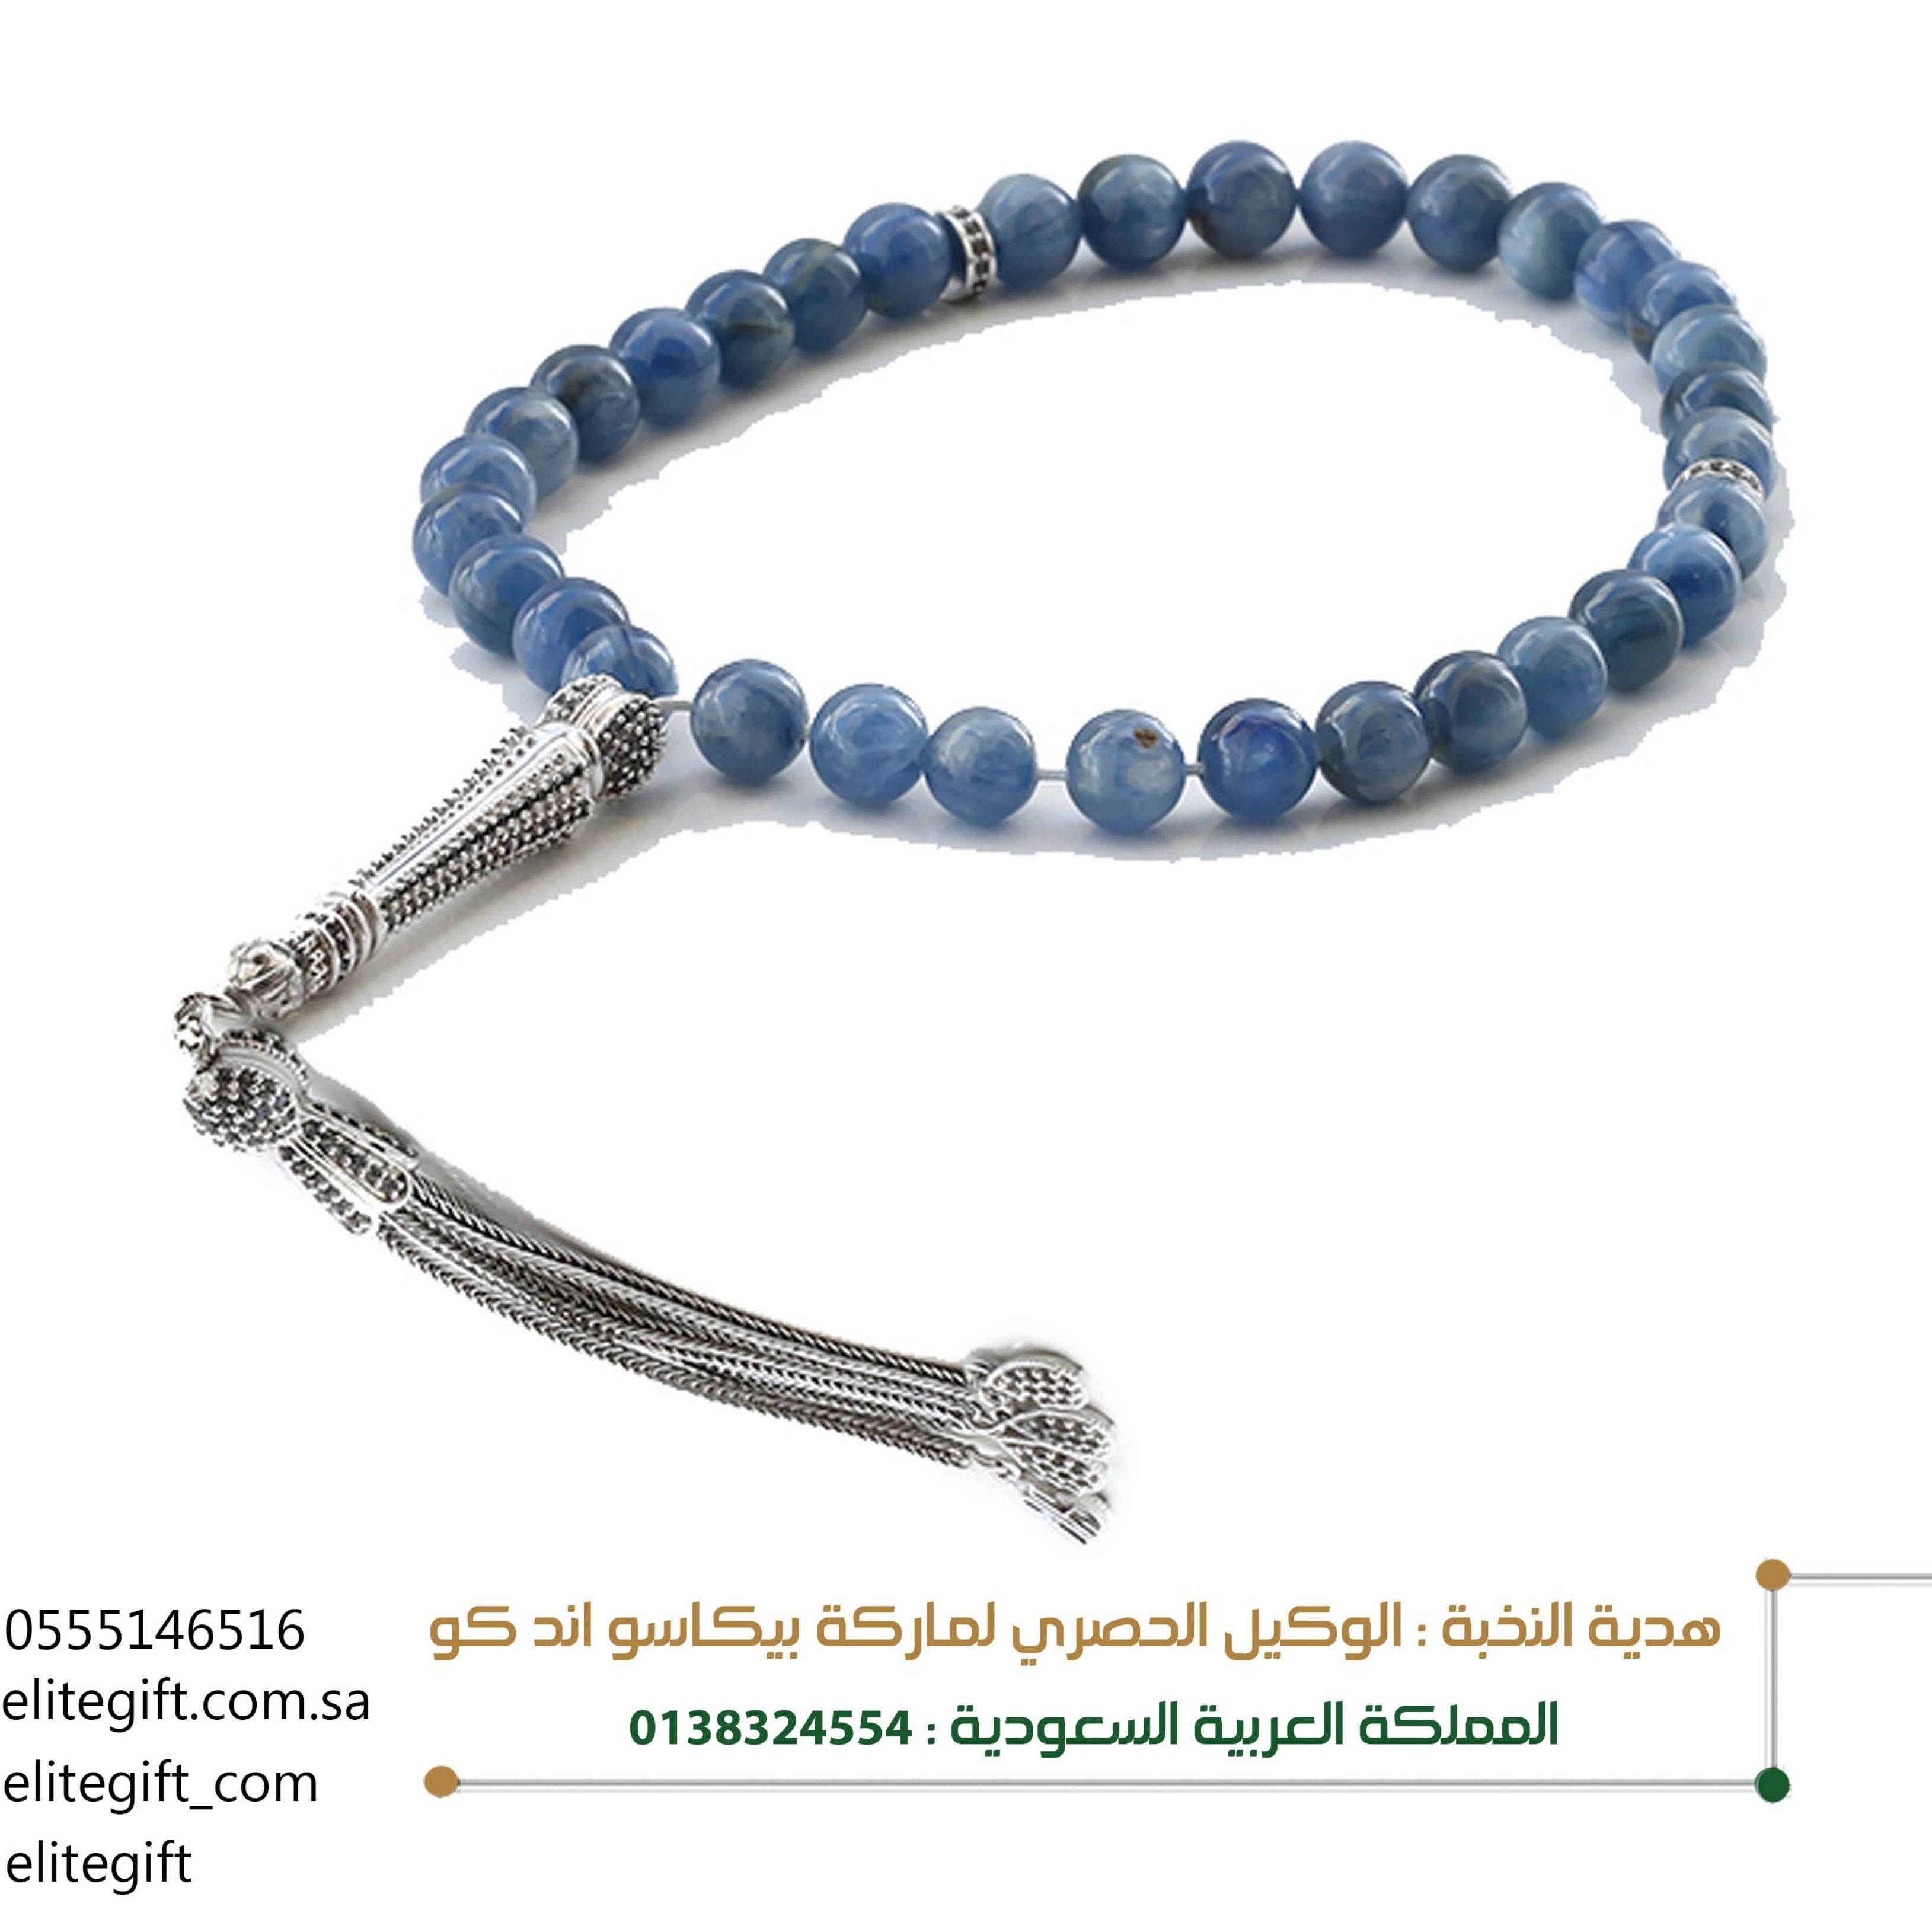 Rosary Lokai Bracelet Live Lokai Bracelet Rope Bracelet